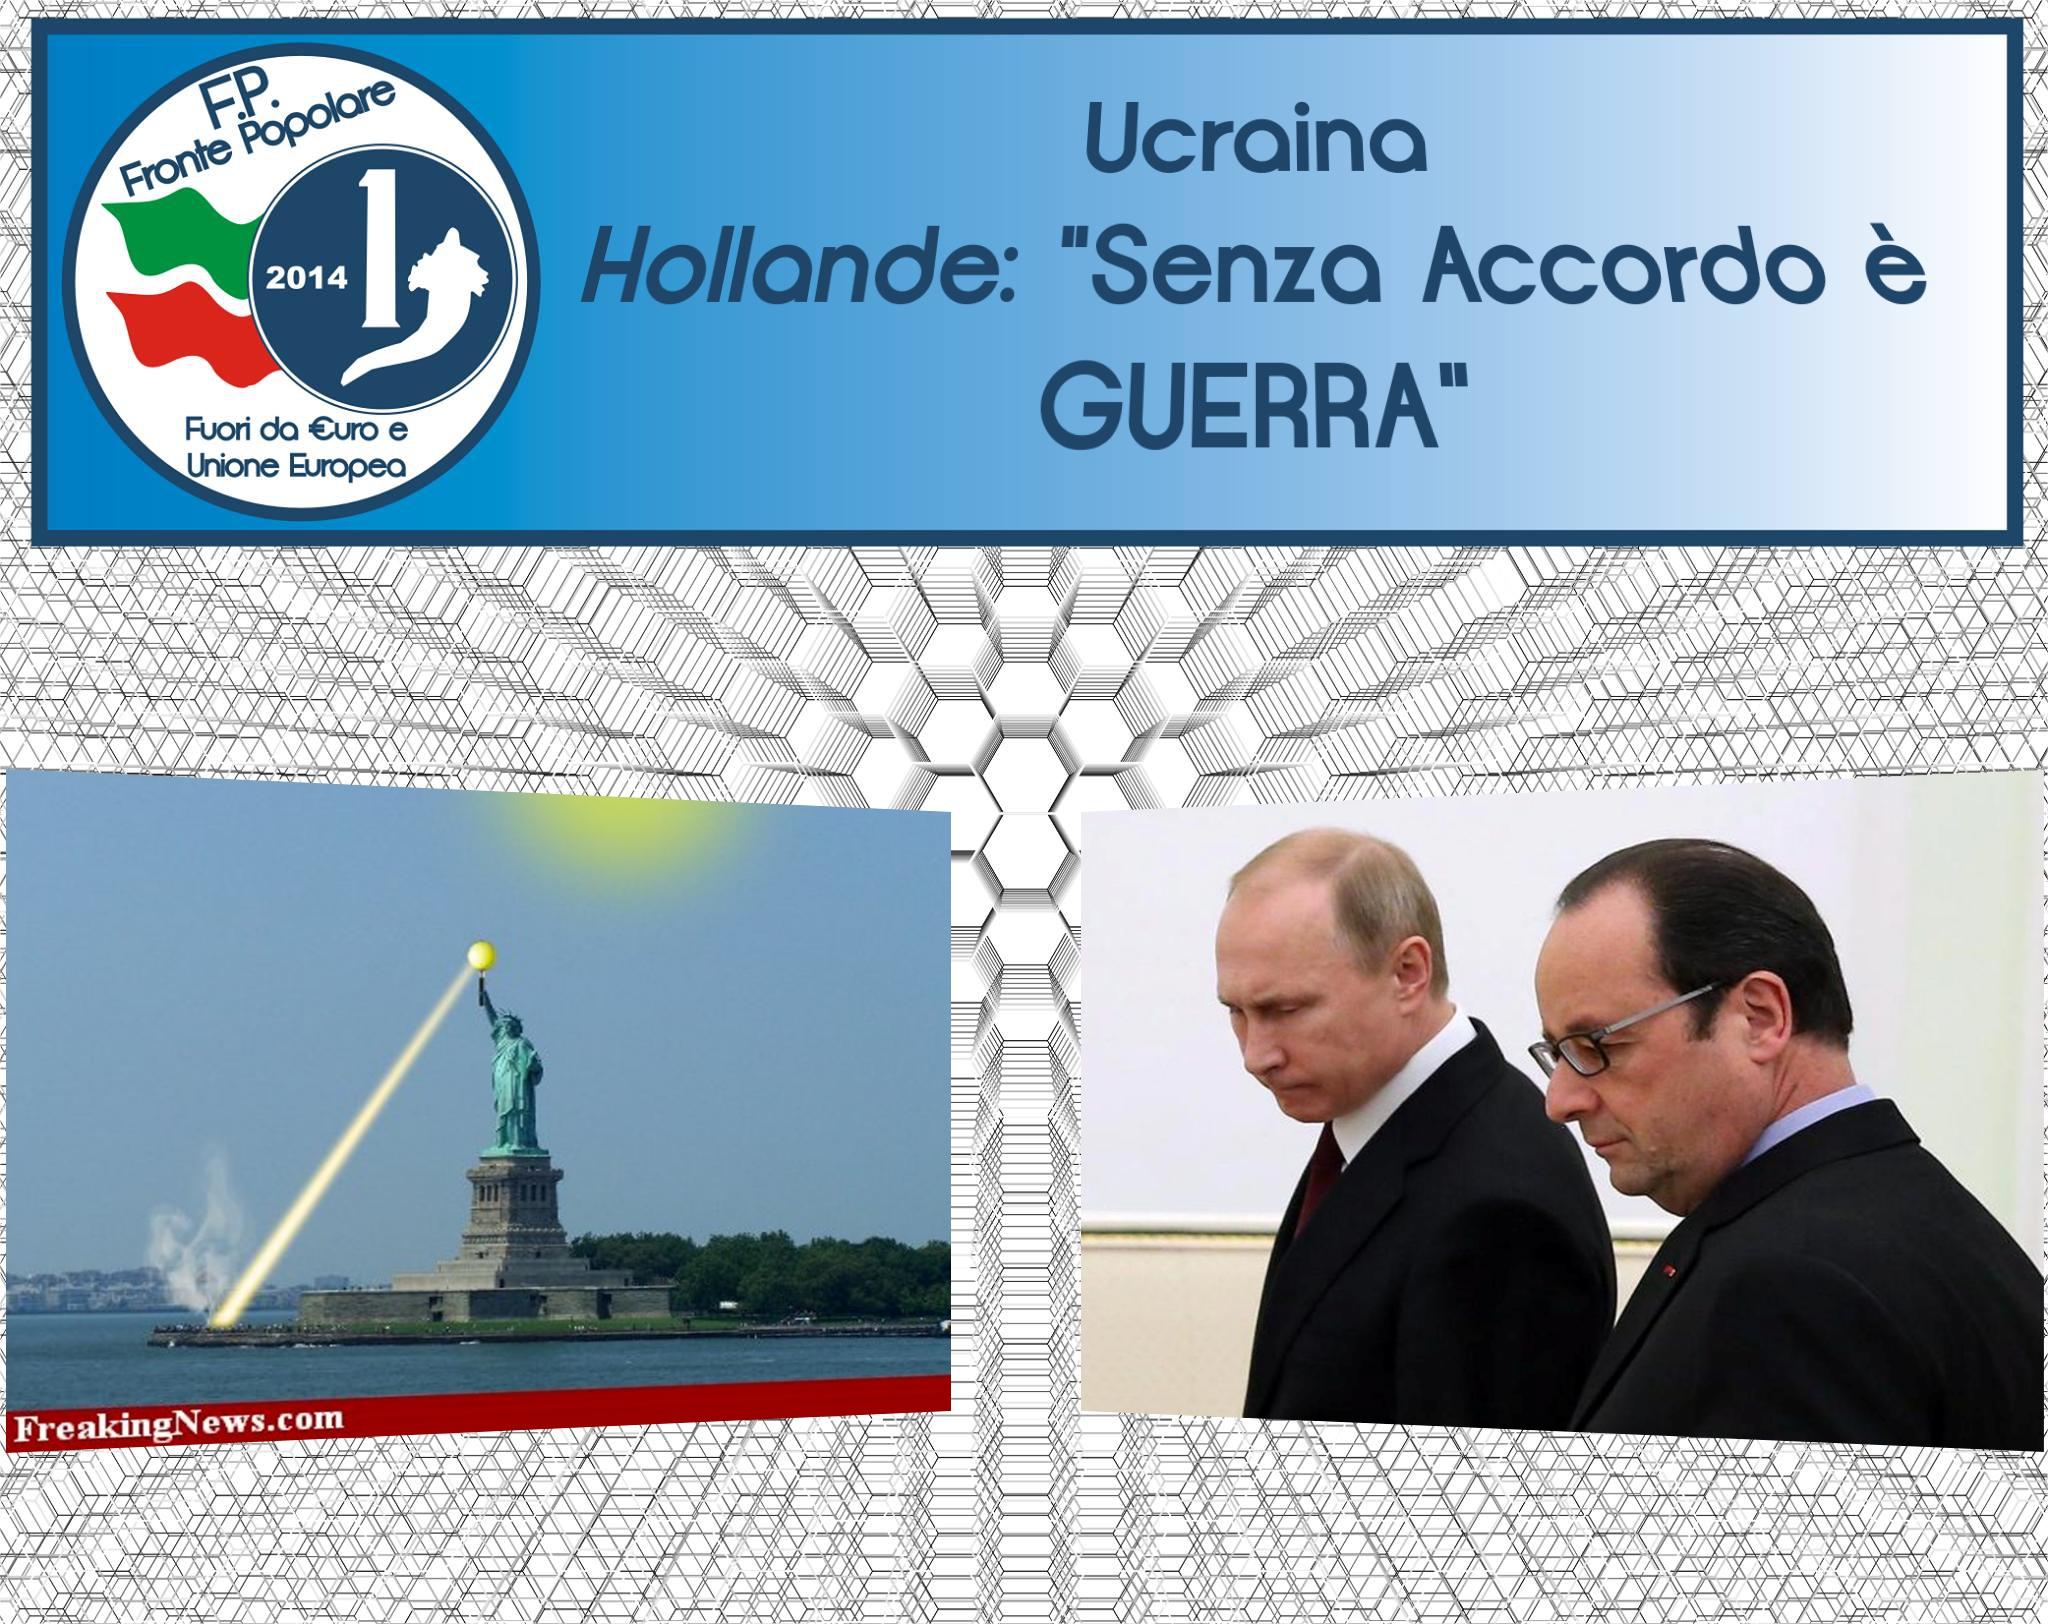 ucraina e guerra_fronte popolare